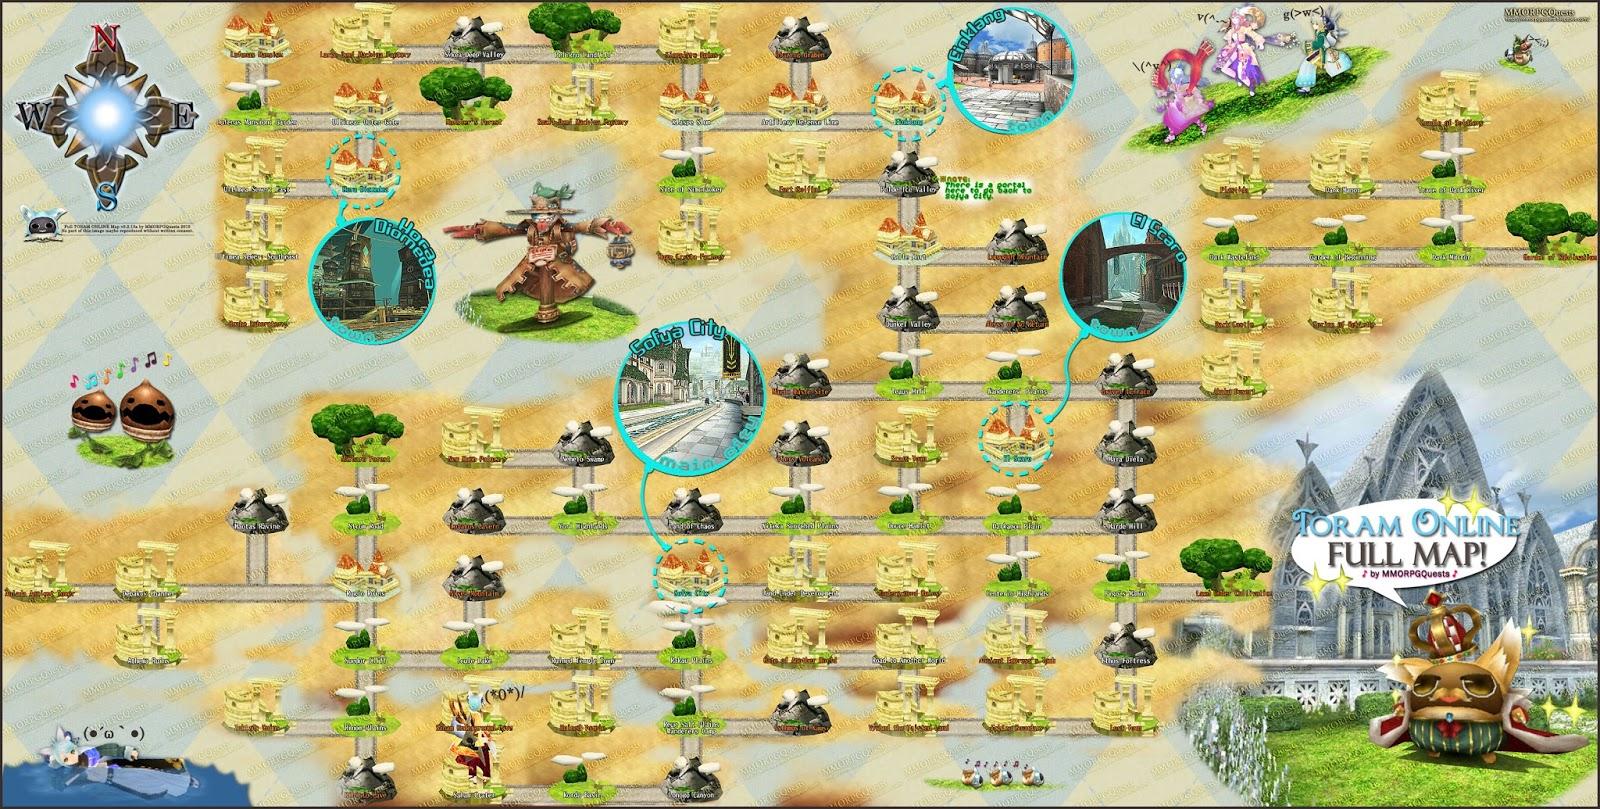 toram online world map Toram Online Full Map V3 2 13a Mmorrg Qyests